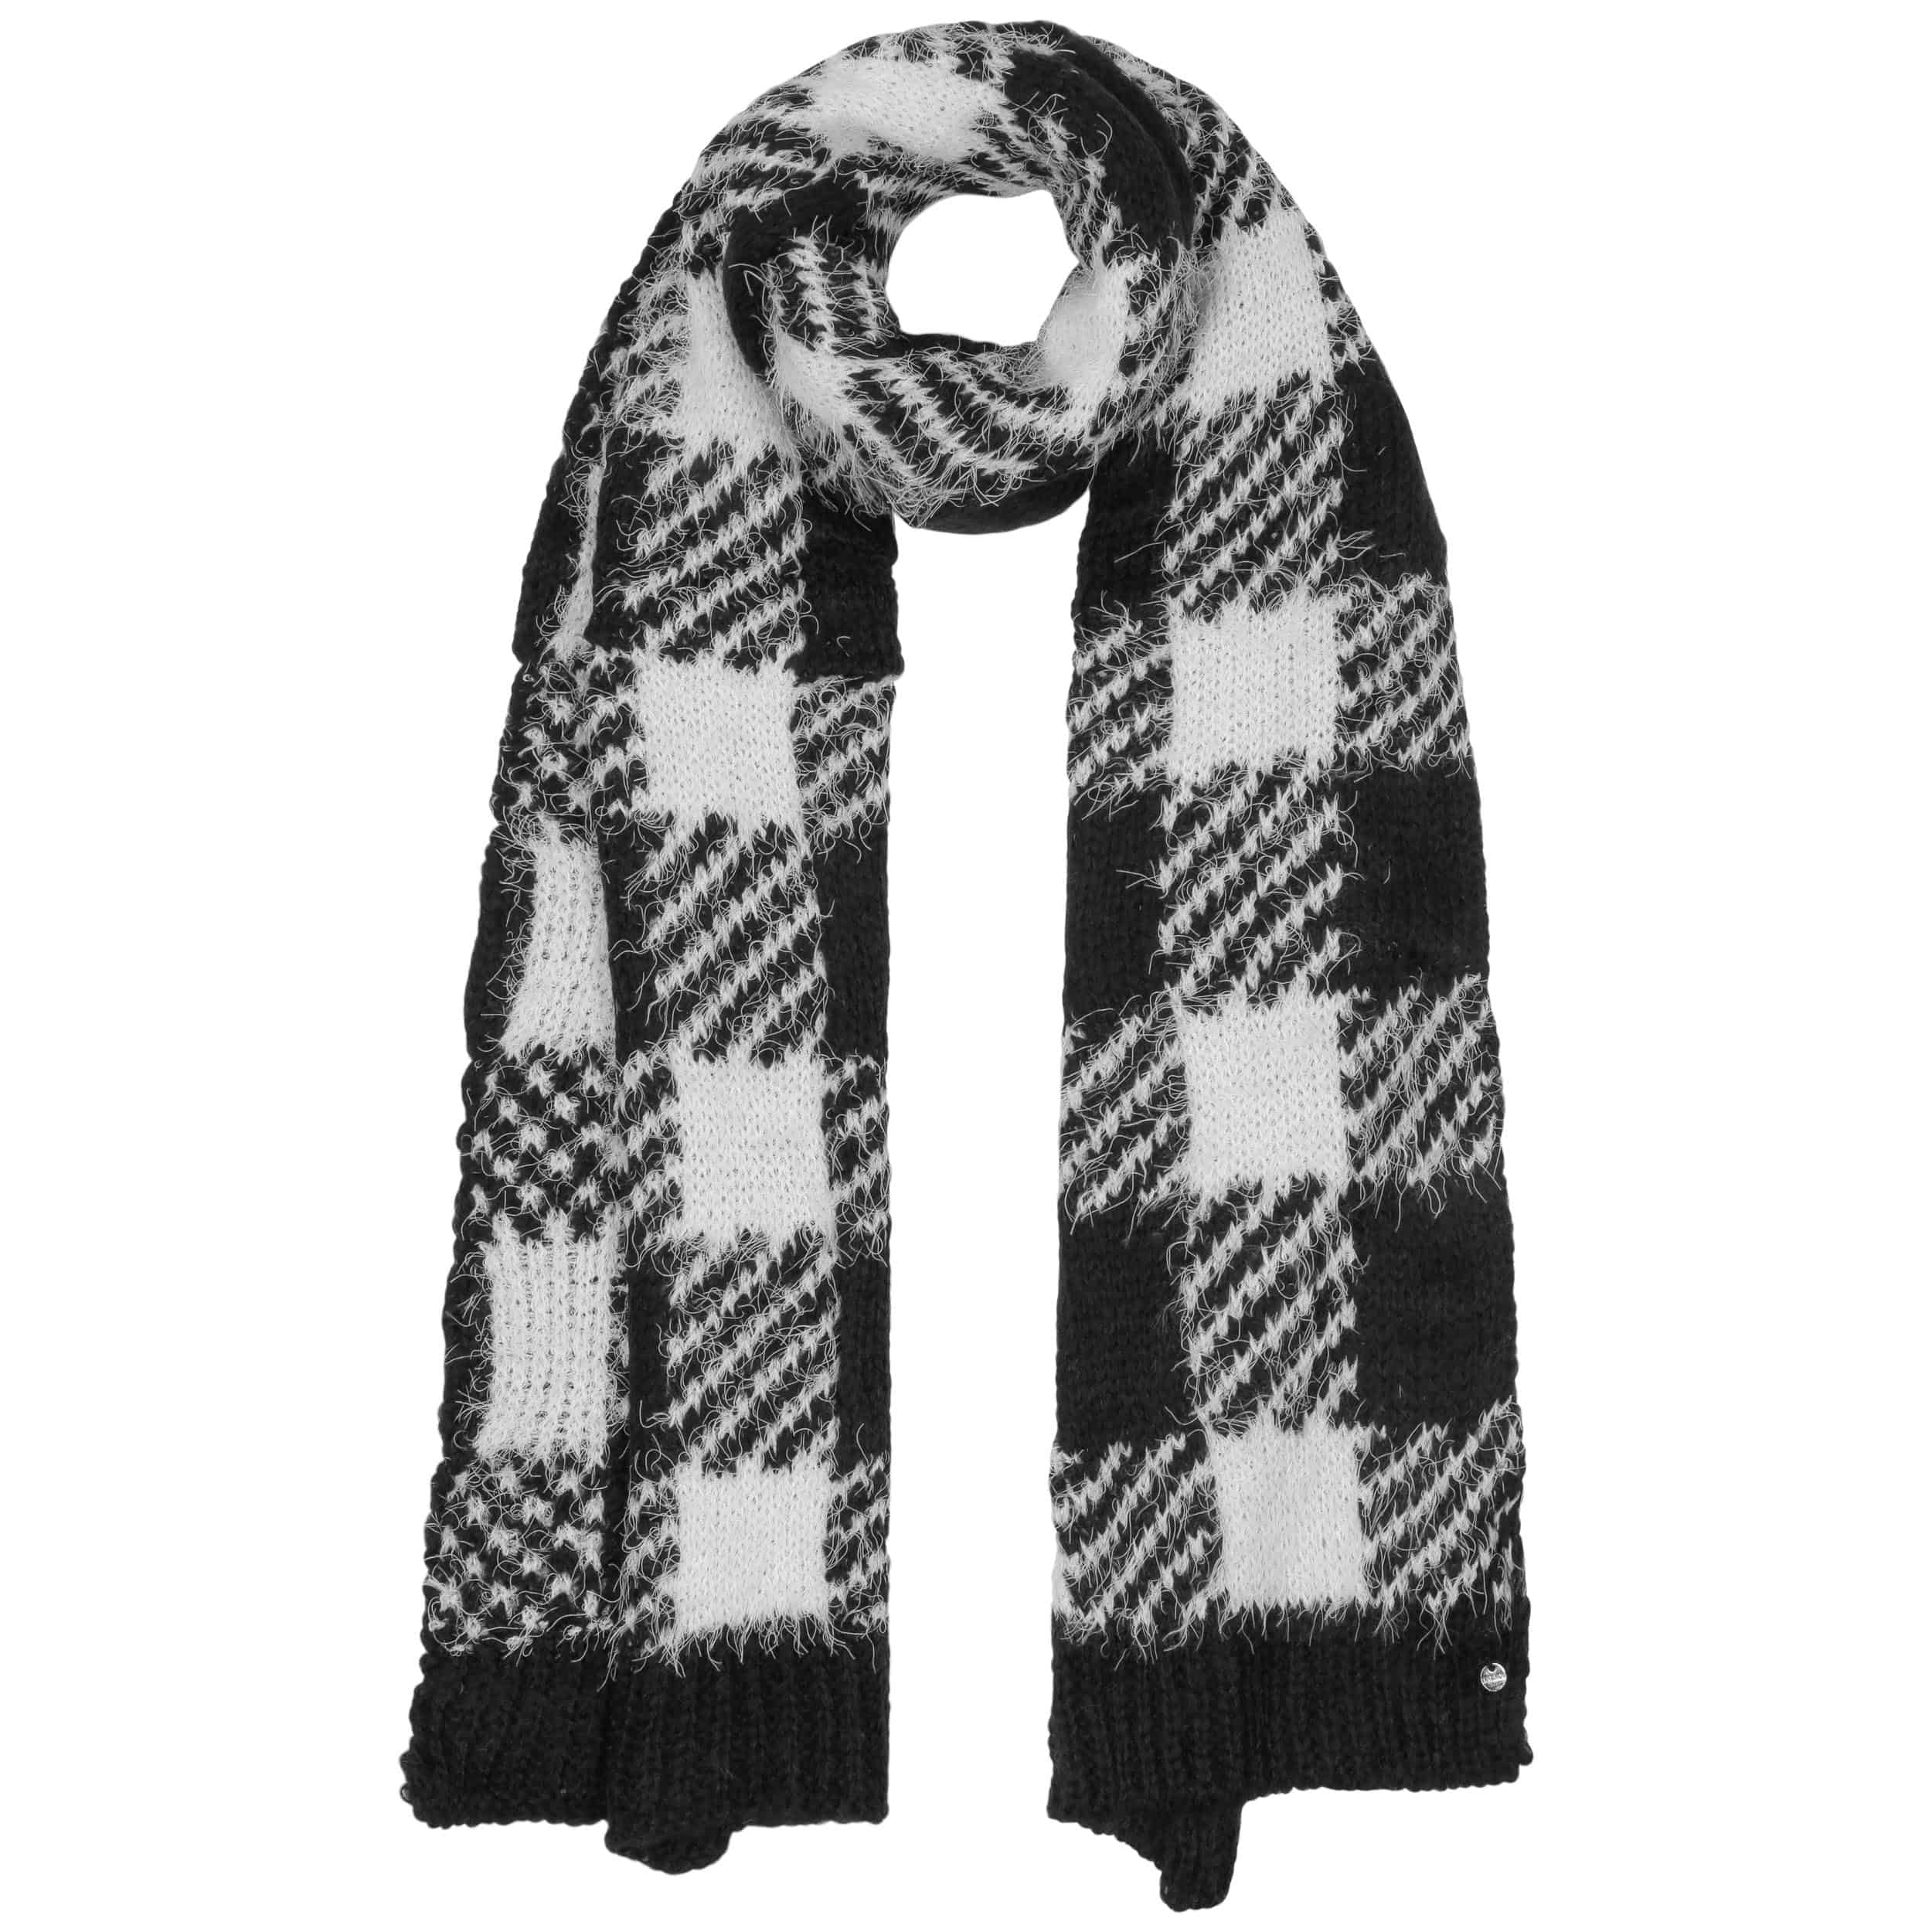 6db8a9d426d ... Big Checker Knit Scarf - white-black 2